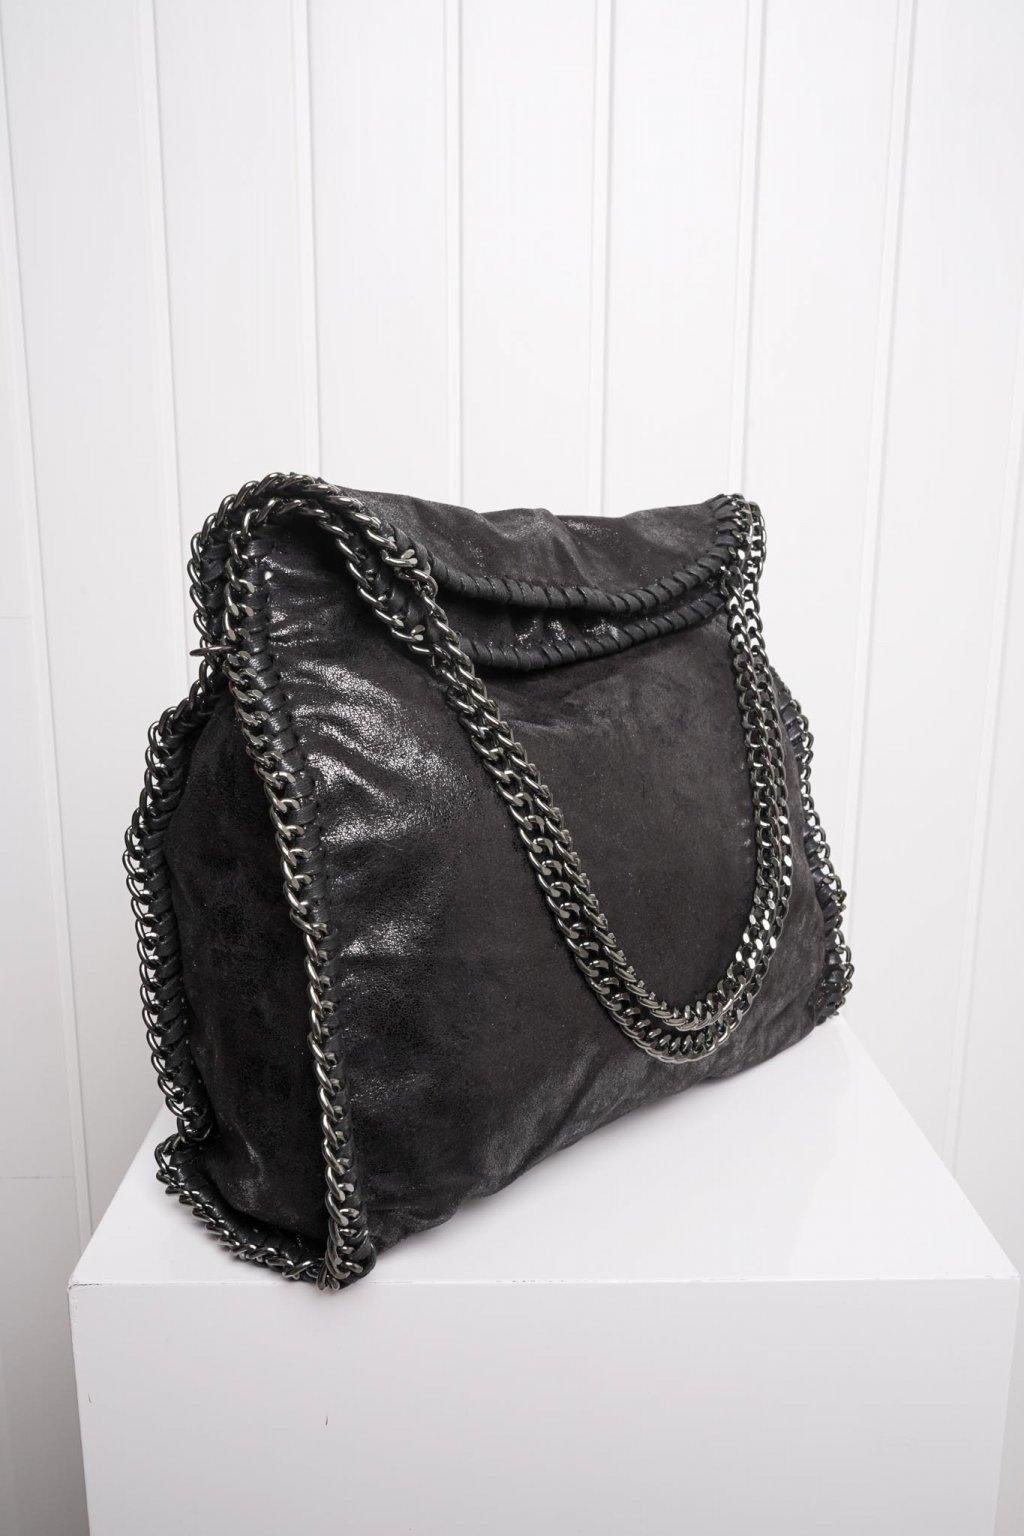 Kabelka, ruksak, dobrá cena, čierna kabelka, čierny ruksak, basic, kabelky, ruksaky 071